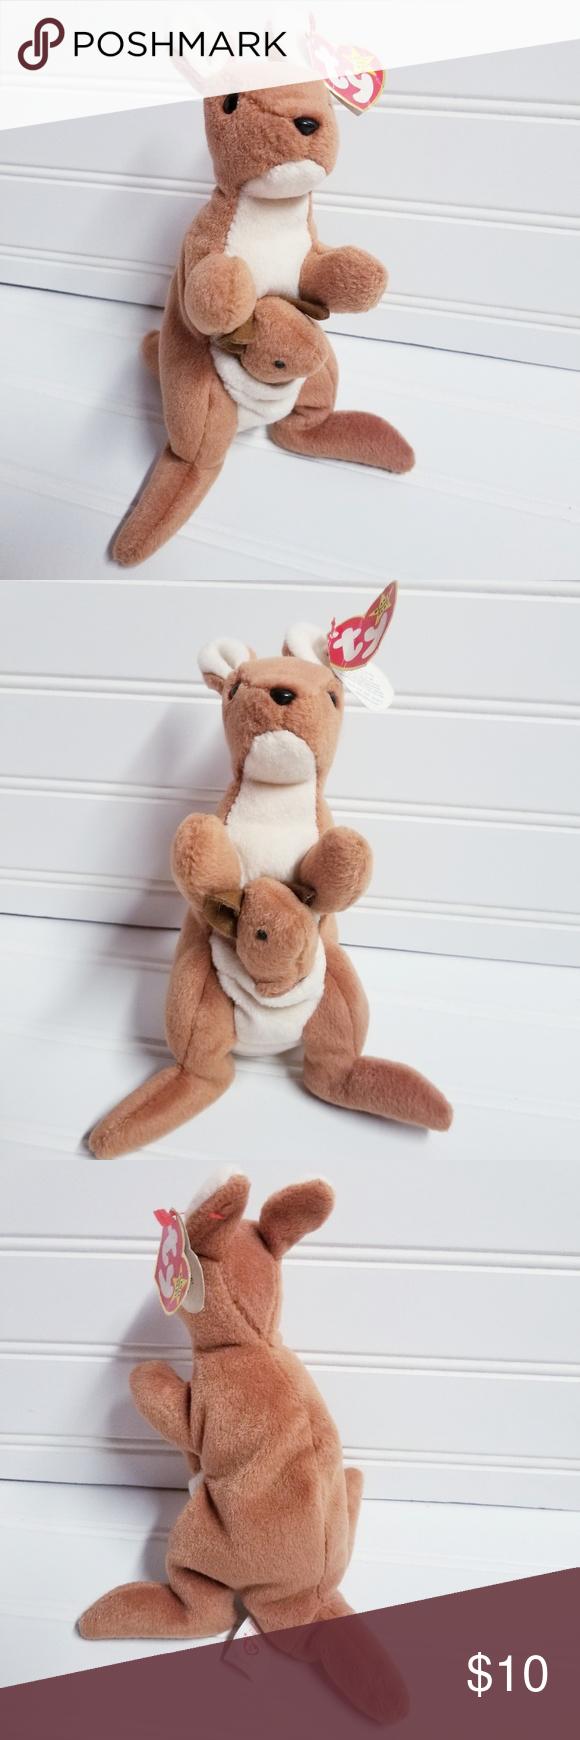 Pouch the Kangaroo Beanie Babies Original #4161